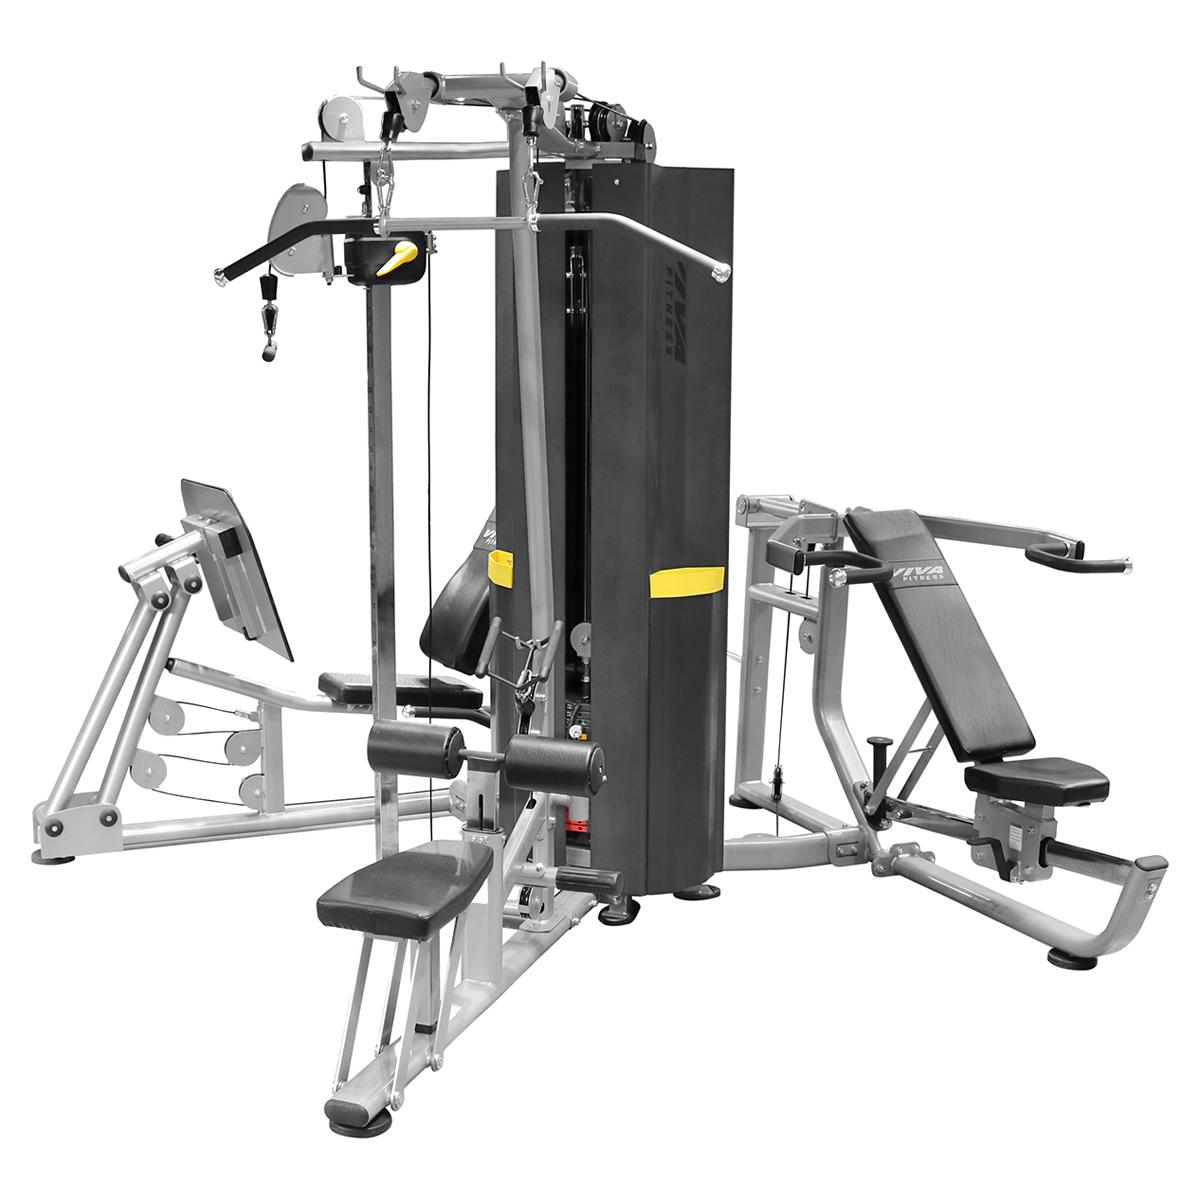 618LP Endurance Heavy Duty Commercial Multi Gym